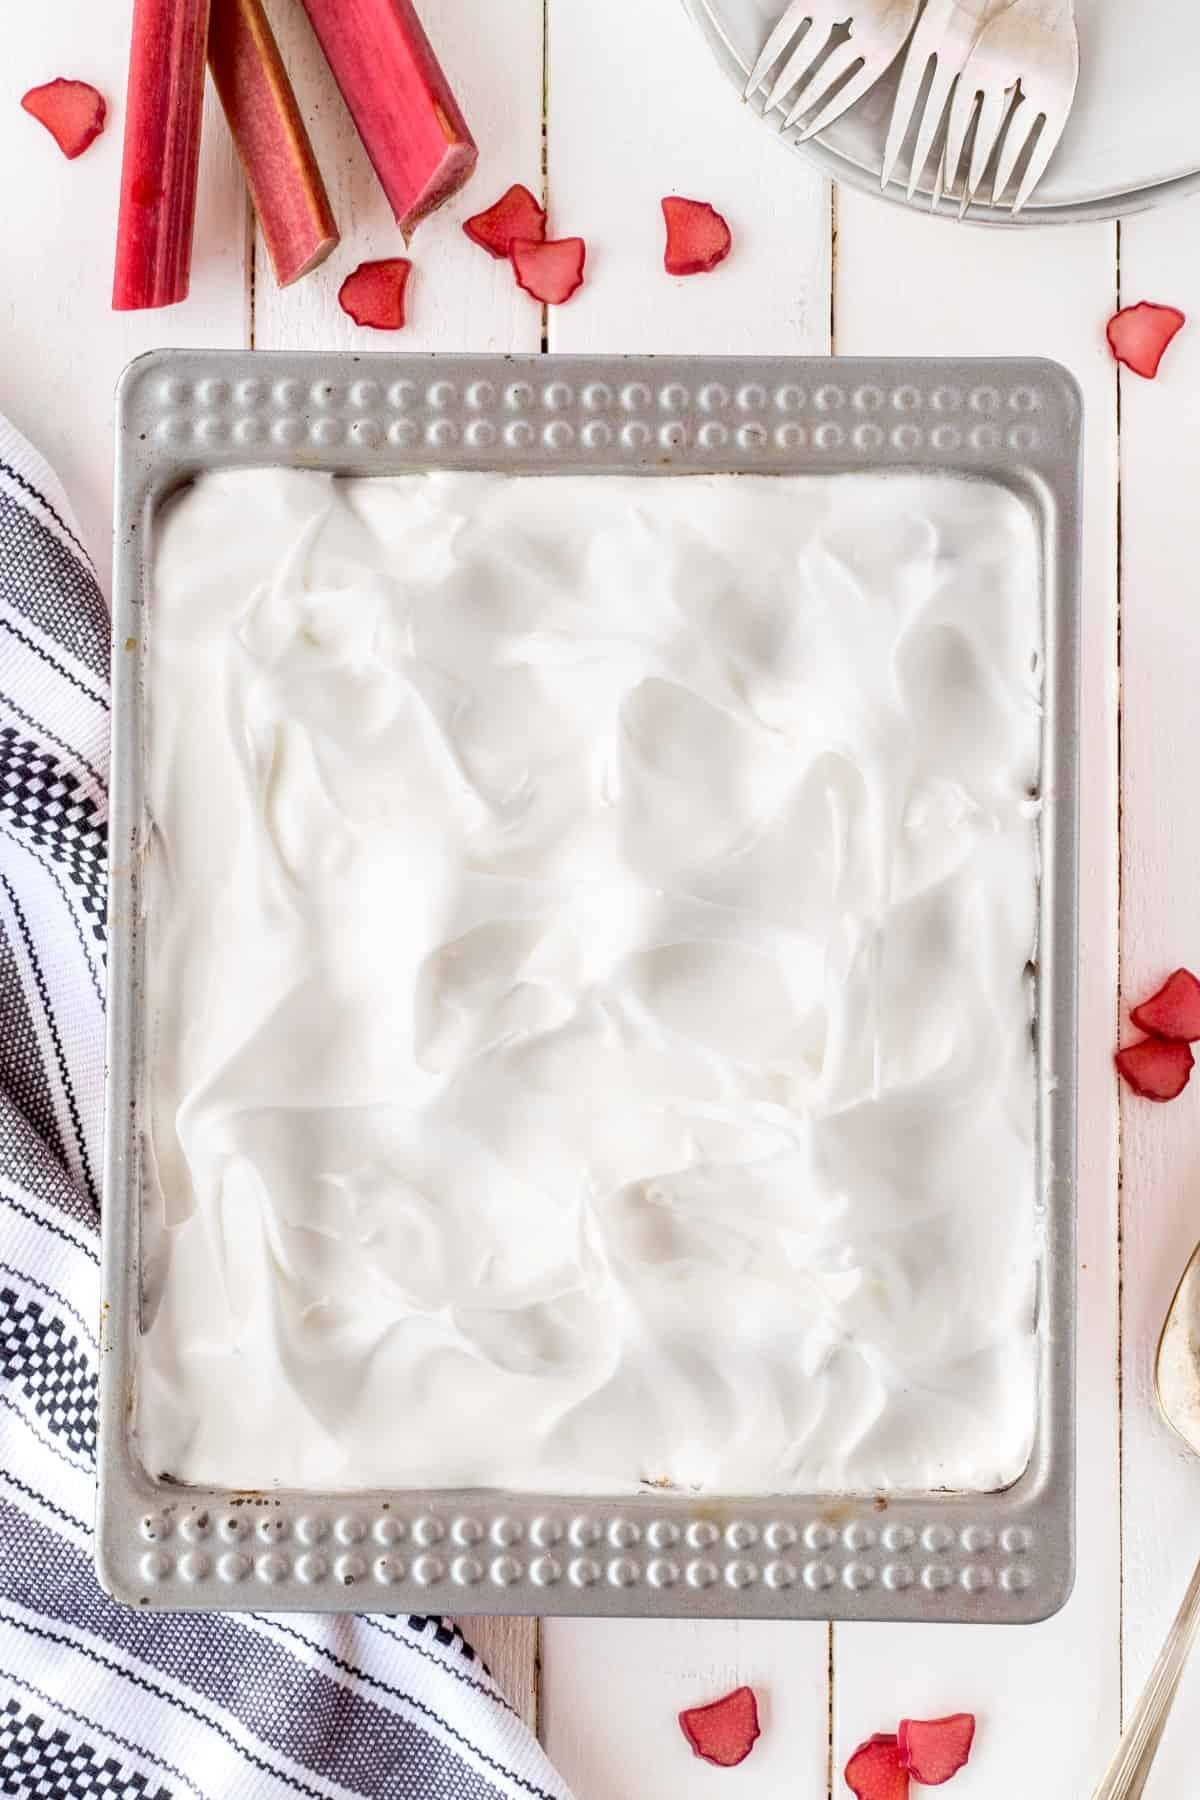 Showing rhubarb meringue dessert in pan from an overhead shot.